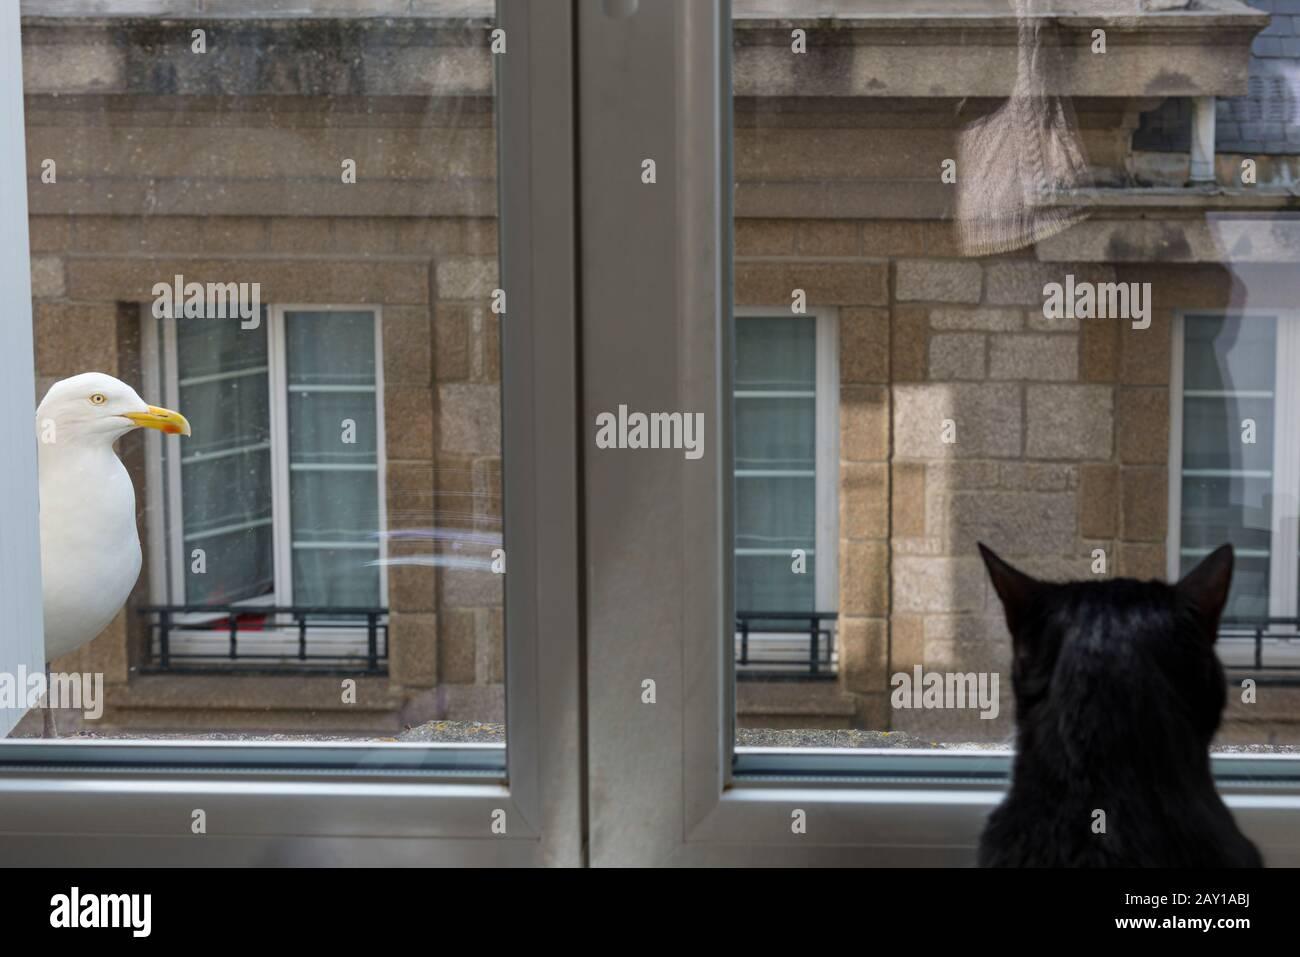 Un chat noir regarde par la fenêtre une mouette posée sur la rambarde d'un immeuble. Un gato negro mira por la ventana a una gaviota en el Foto de stock